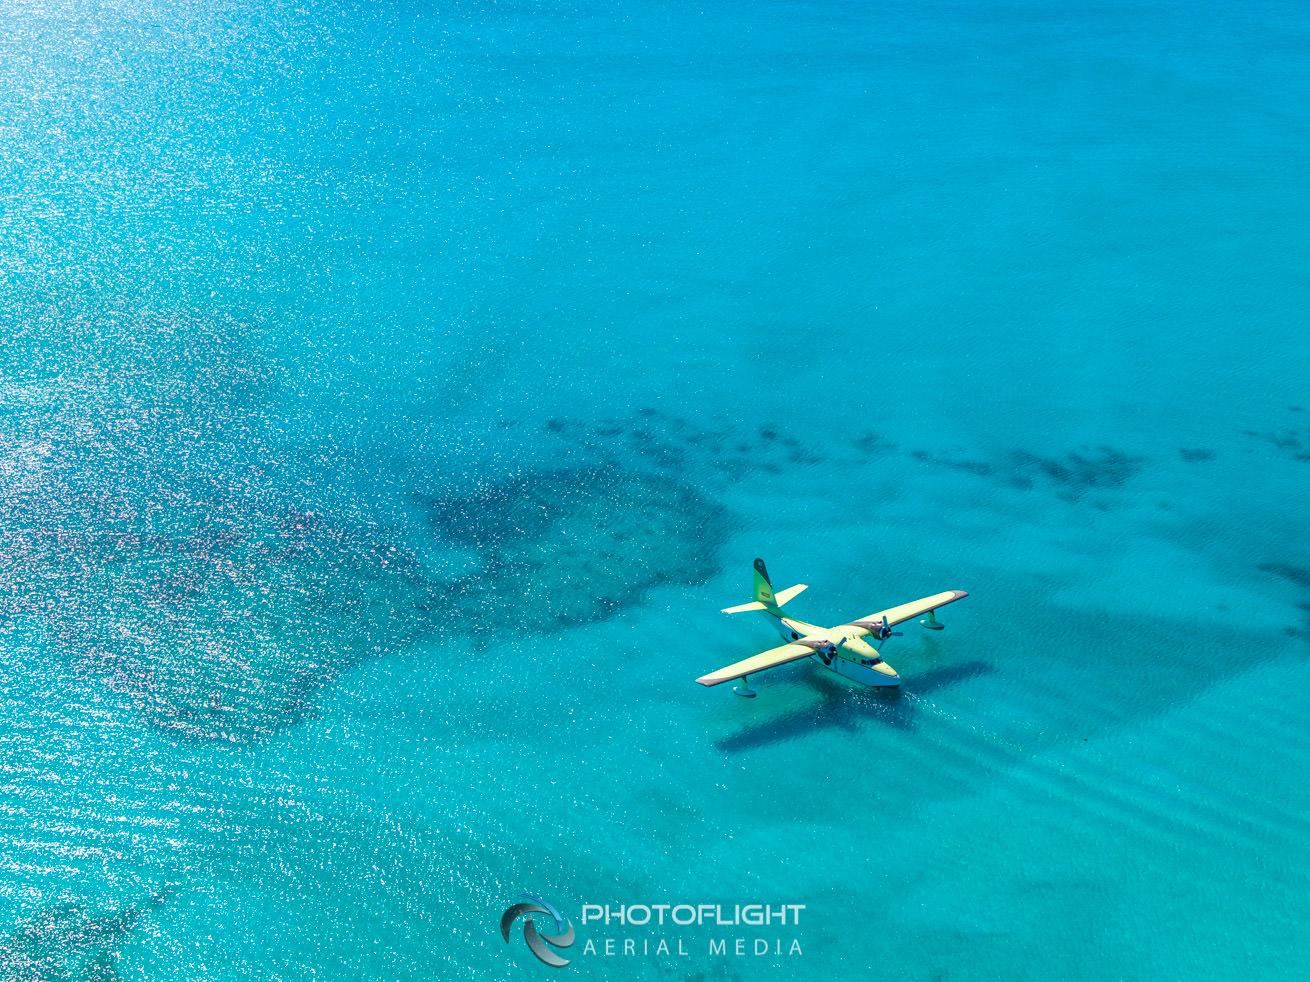 Flying Boat Film Bahamas, PhotoFlight Aerial Media, professional drone camera operator